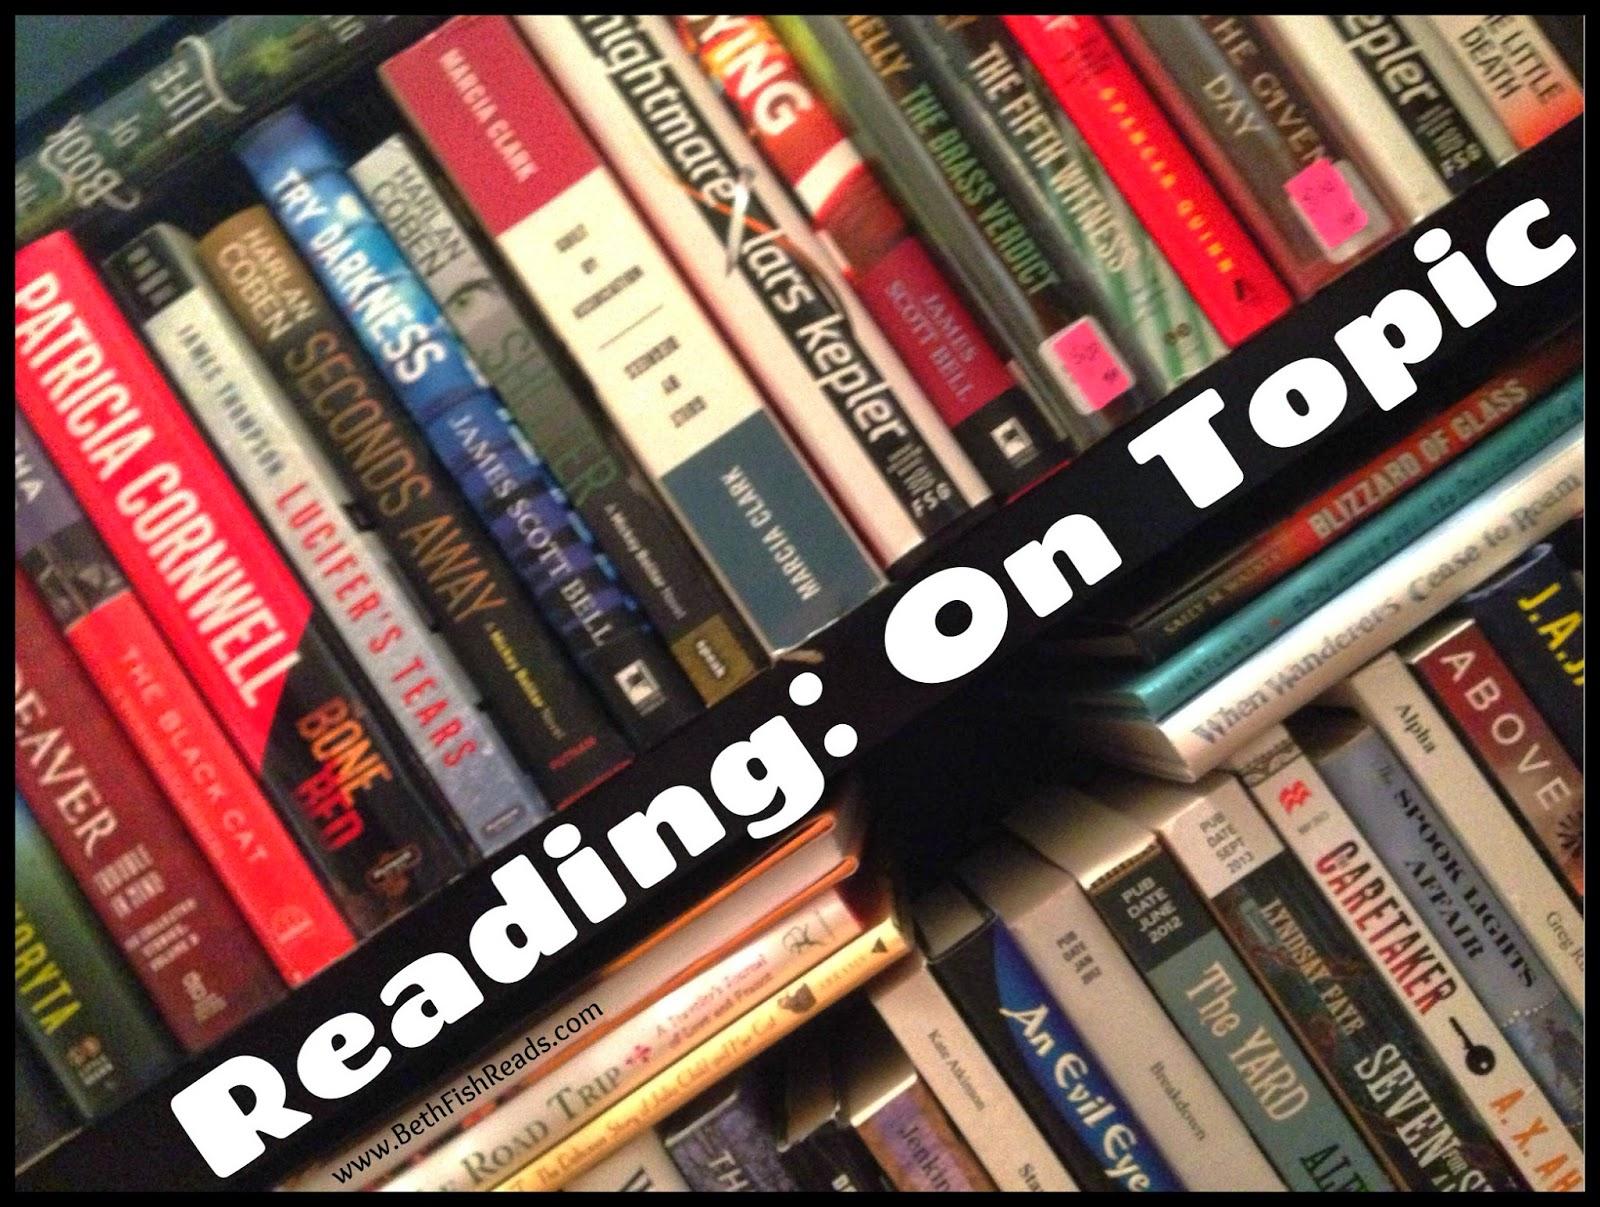 Reading: On Topic @ www.BethFishReads.com